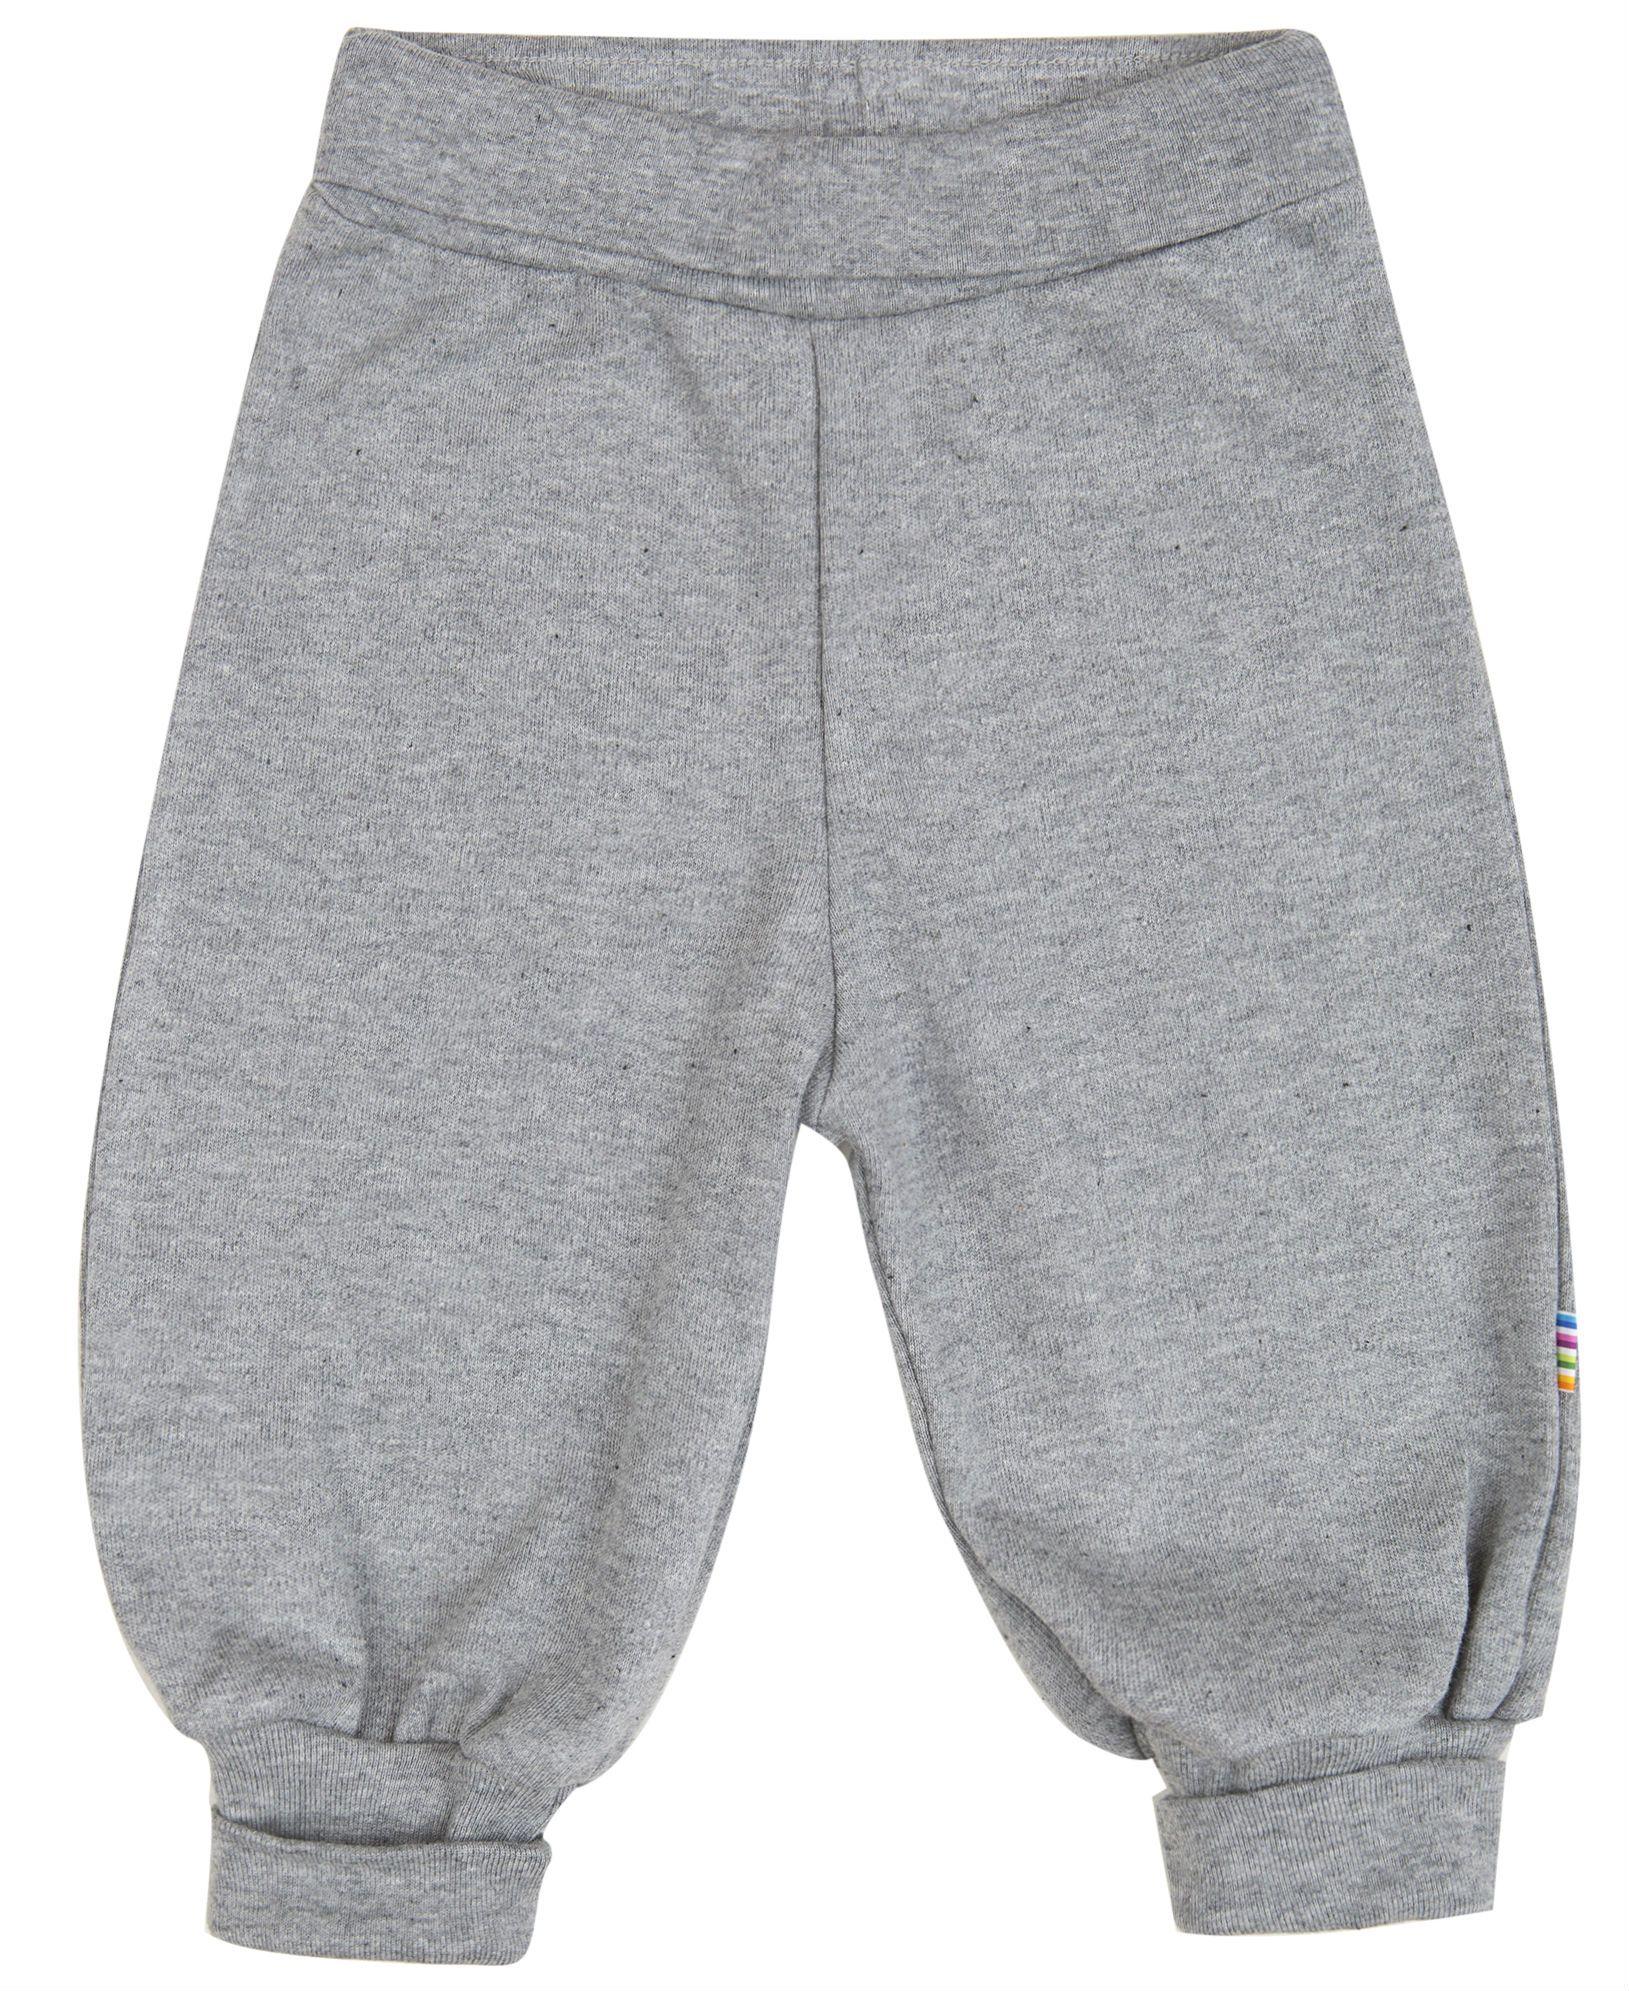 Image of Sweat Pants fra Joha - Grey Melange (20610-28-15000)